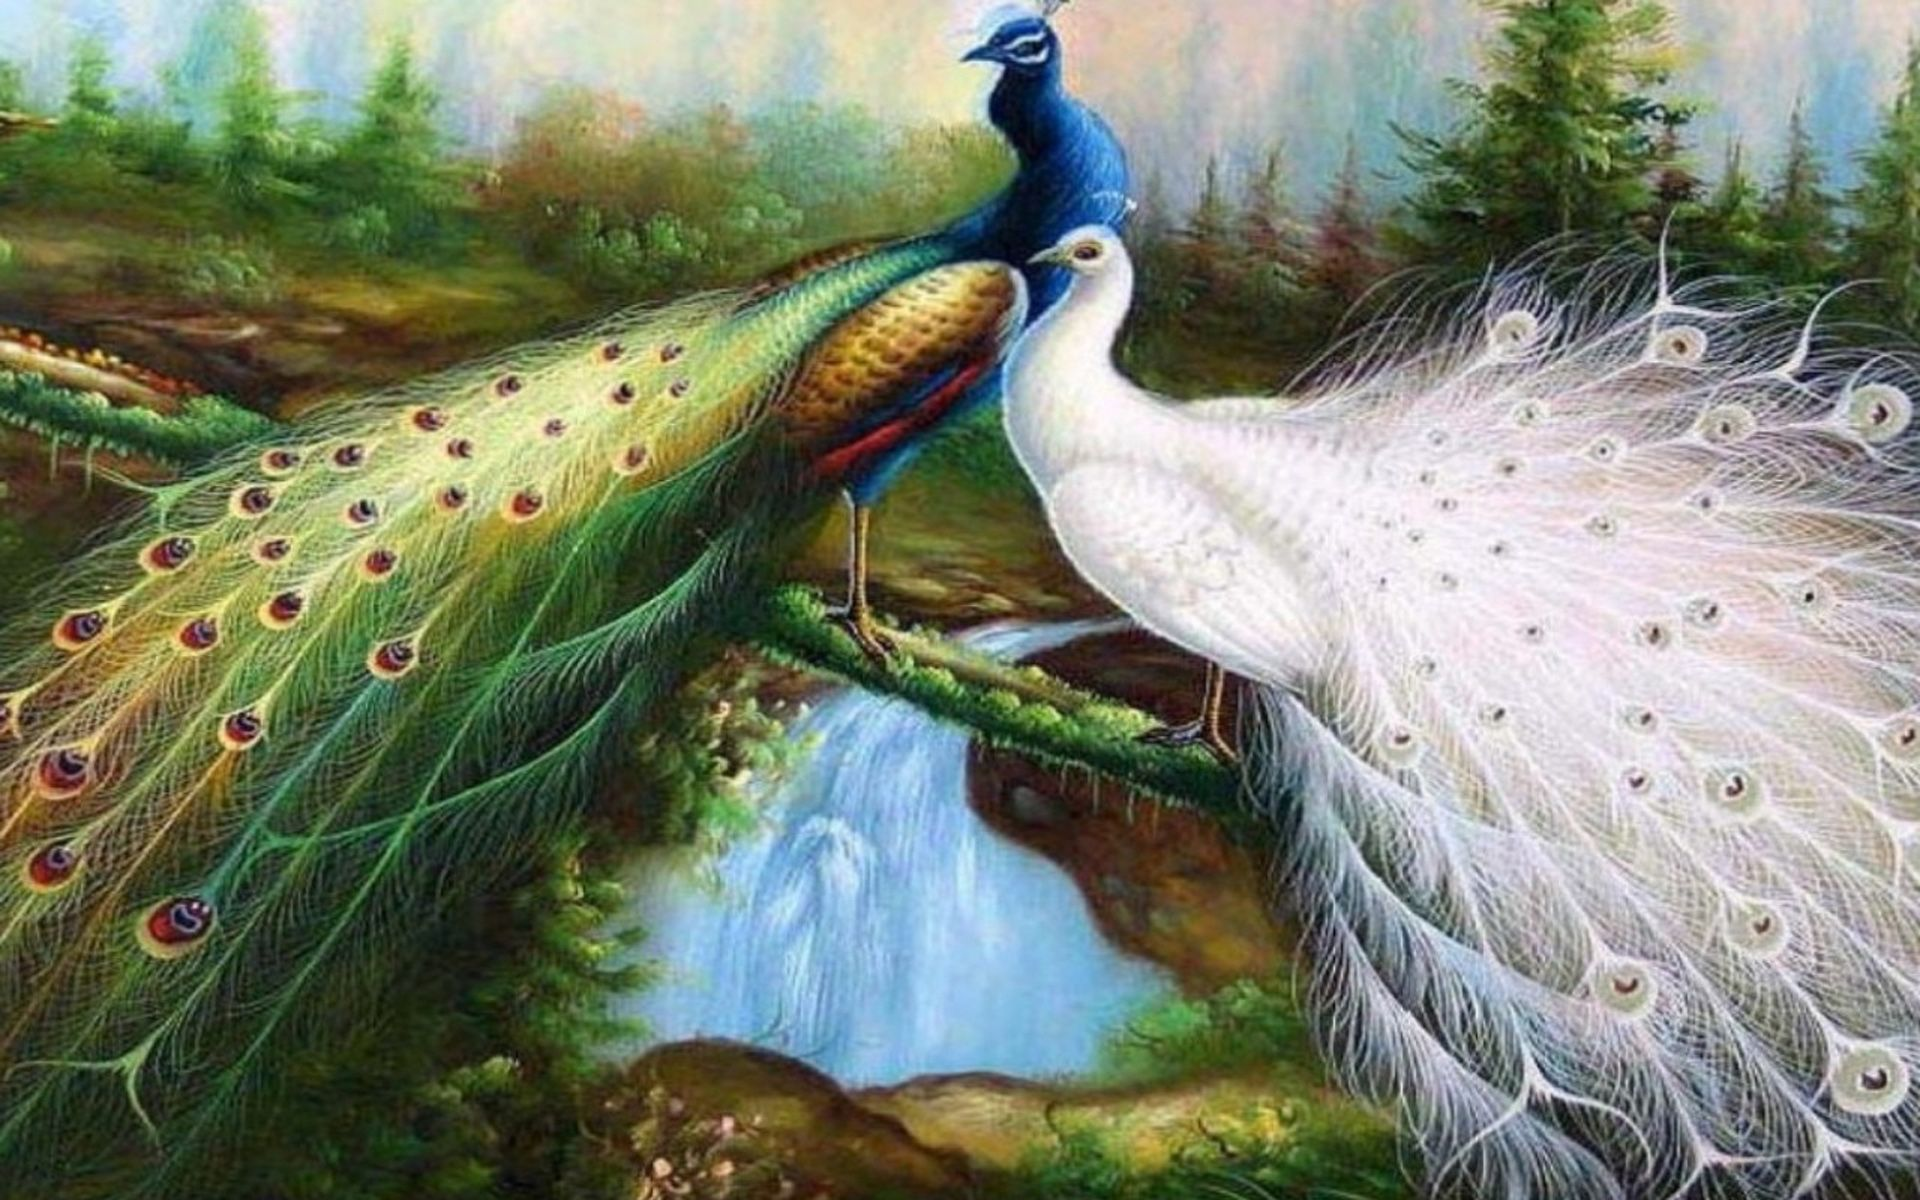 Peacock Wallpaper Roaming In Garden 3d Hd Wallpaper Pinterest